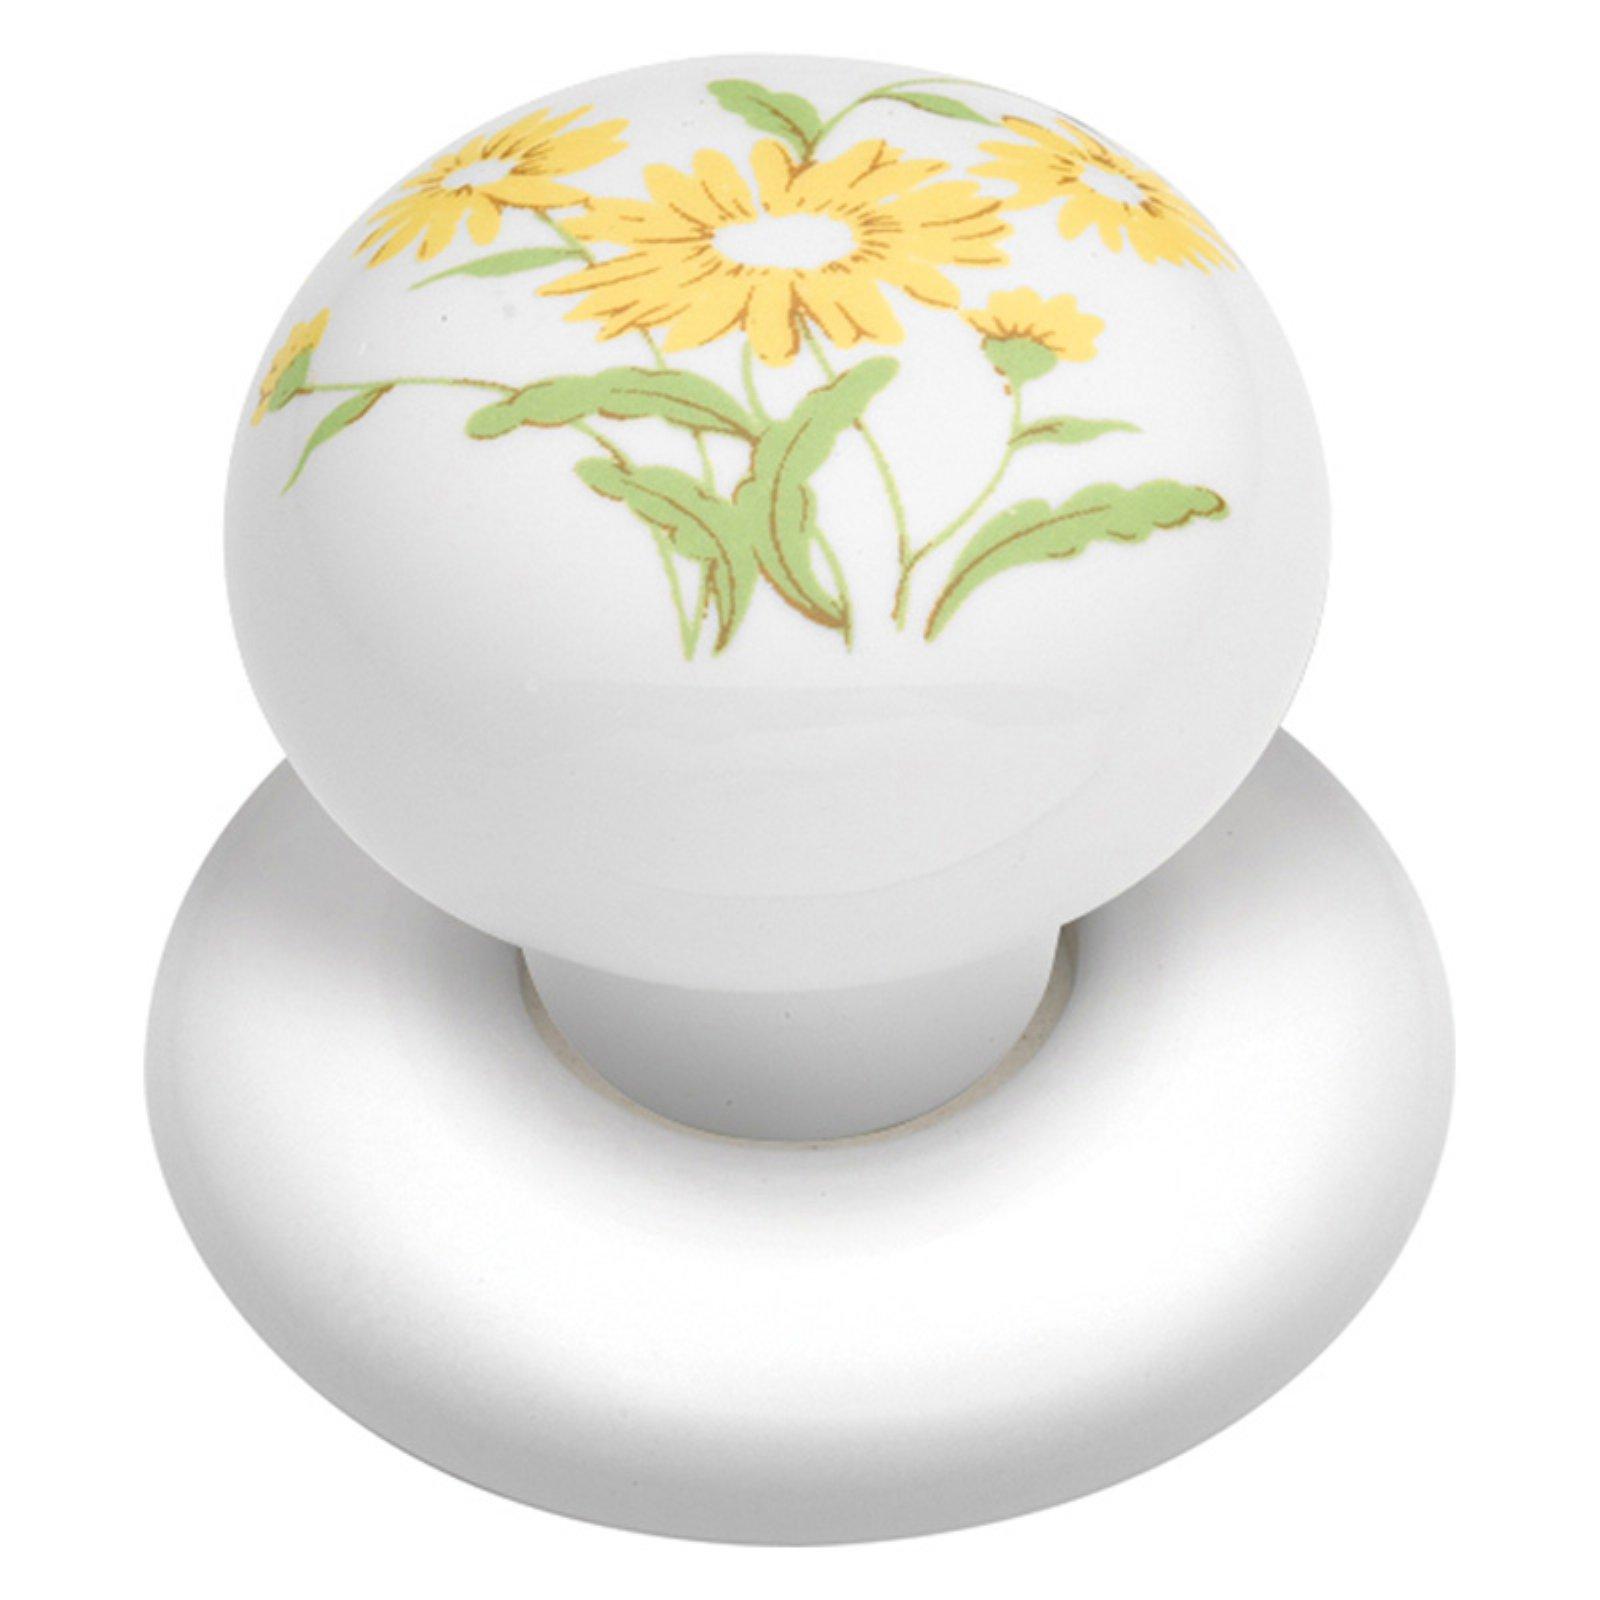 Hickory Hardware English Cozy Yellow Flower Cabinet Knob